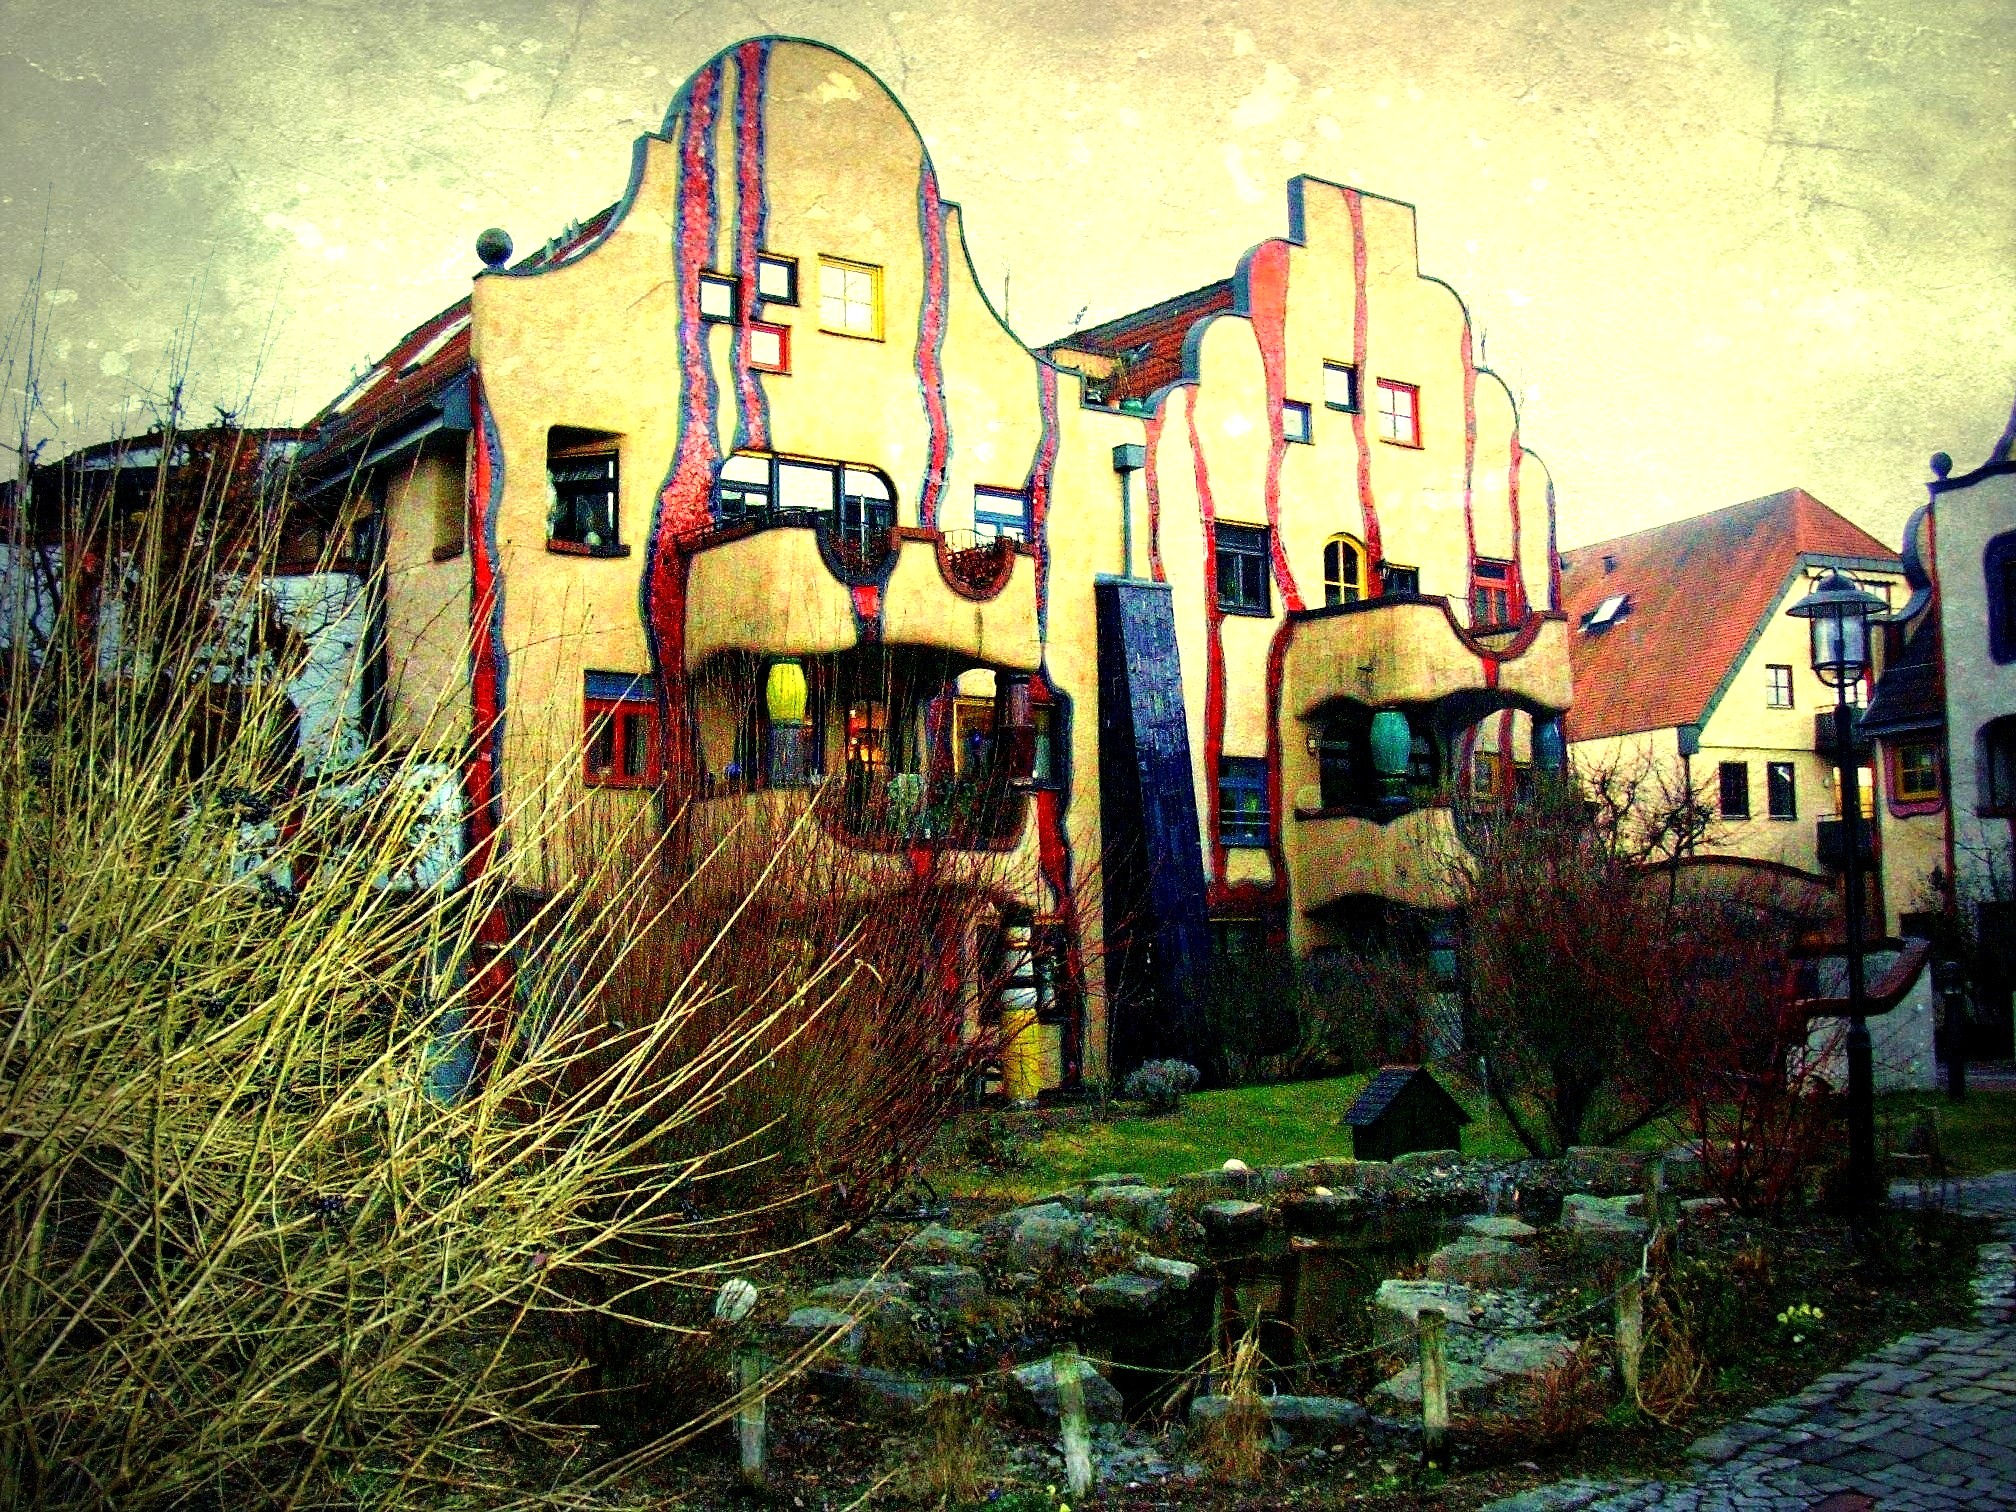 Plochingen- Hier war der Künstler Hundertwasser aktiv,62-53/1826